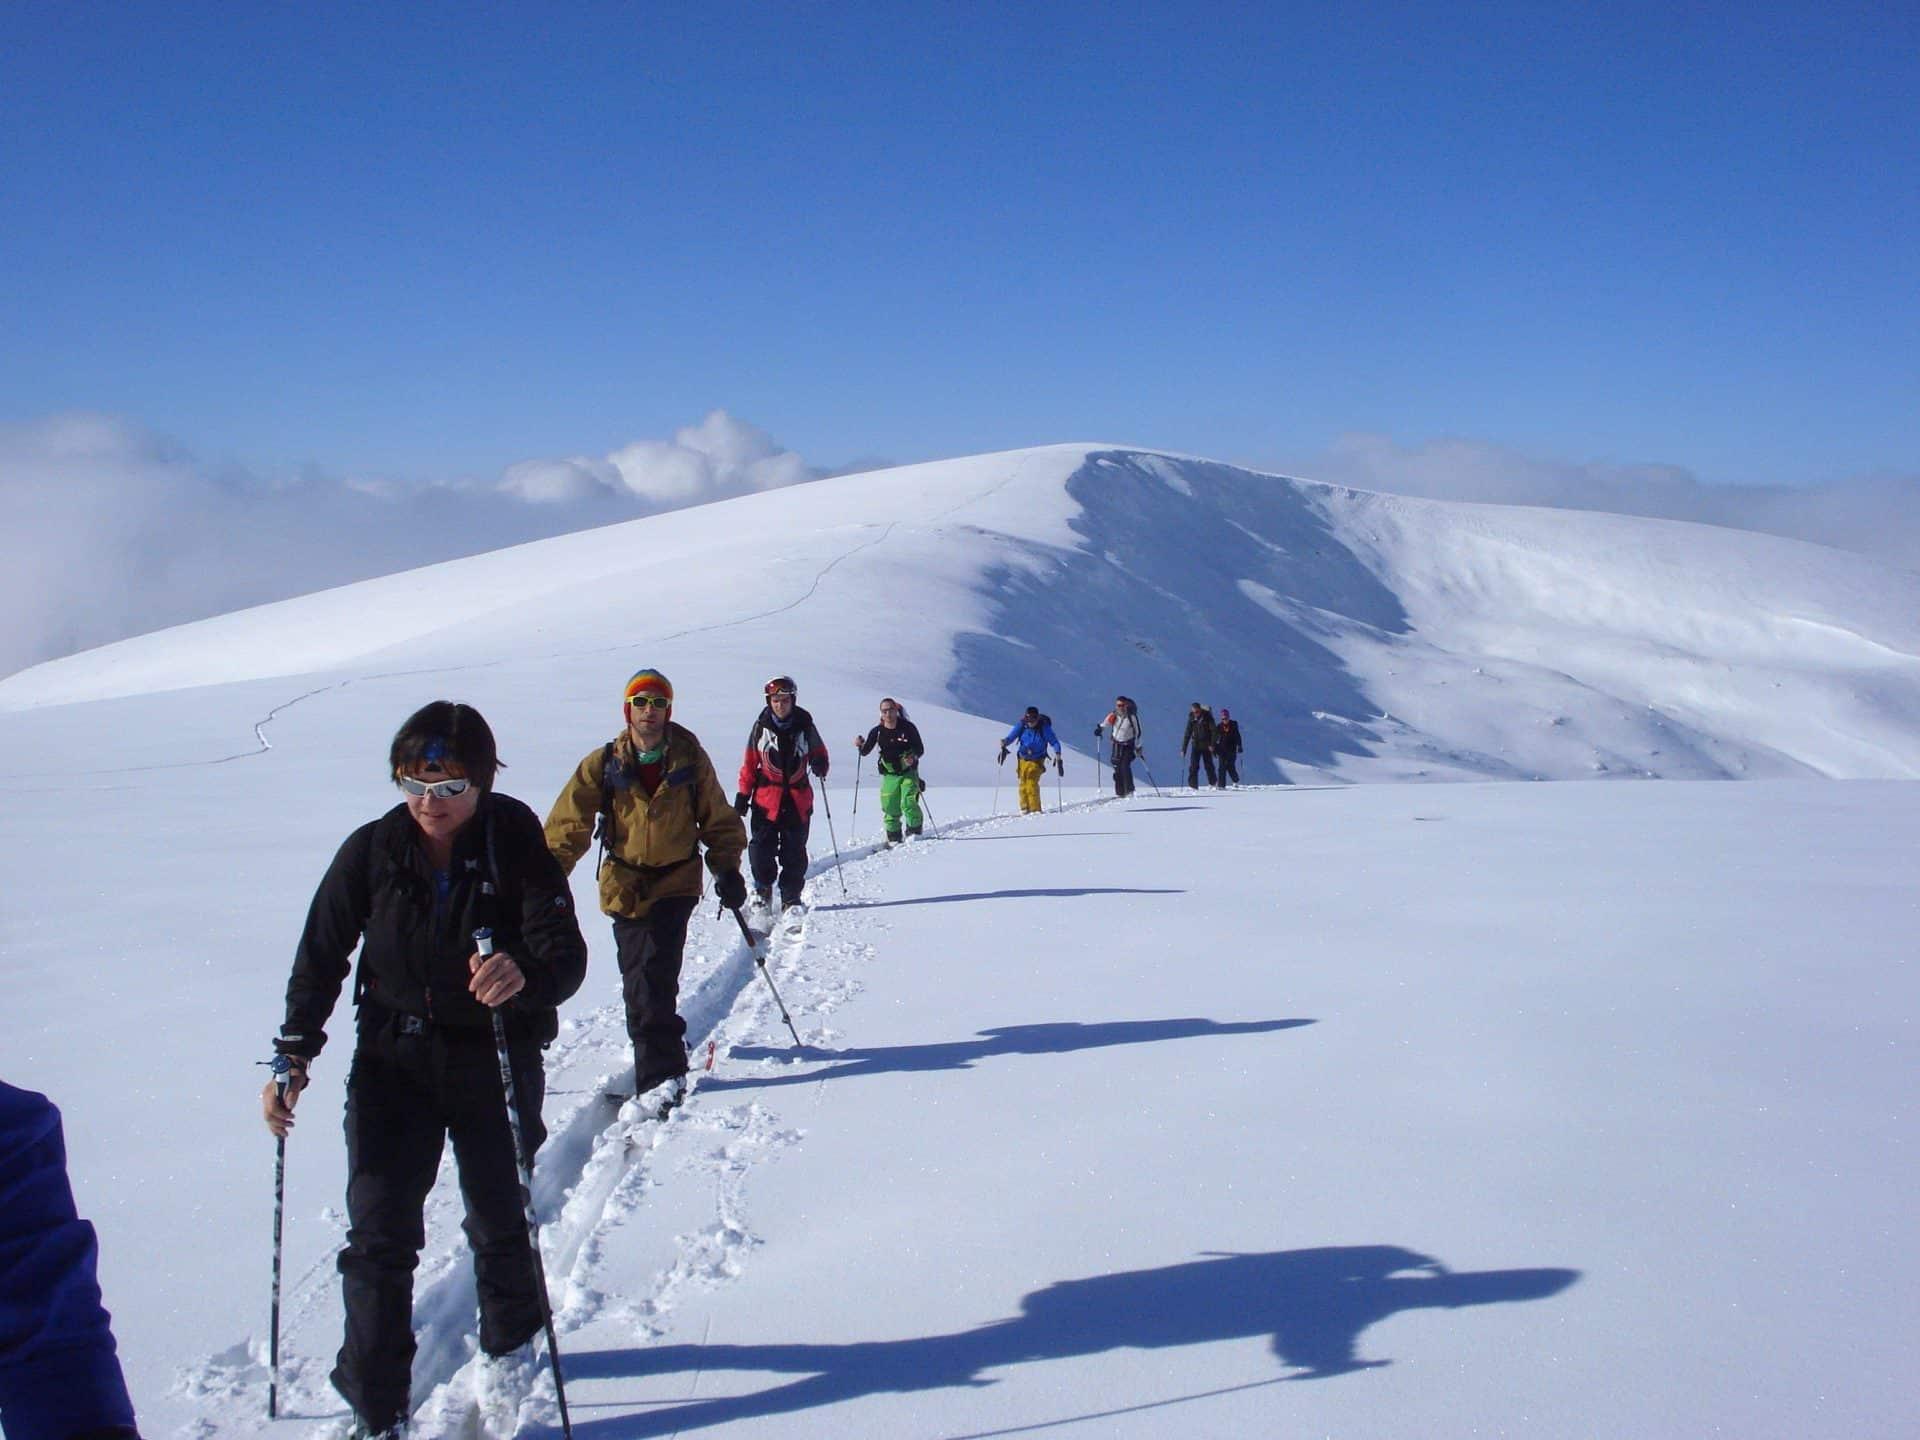 Rila mountains hut to hut ski touring 2-day trip